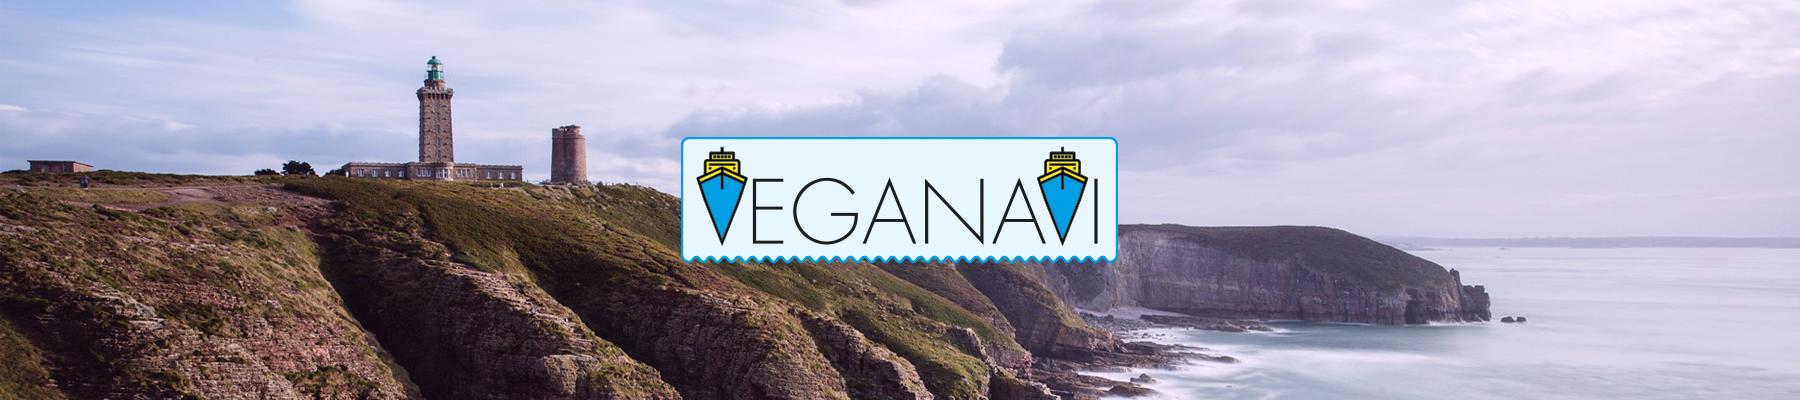 Veganavi – Le Crociere del Sole